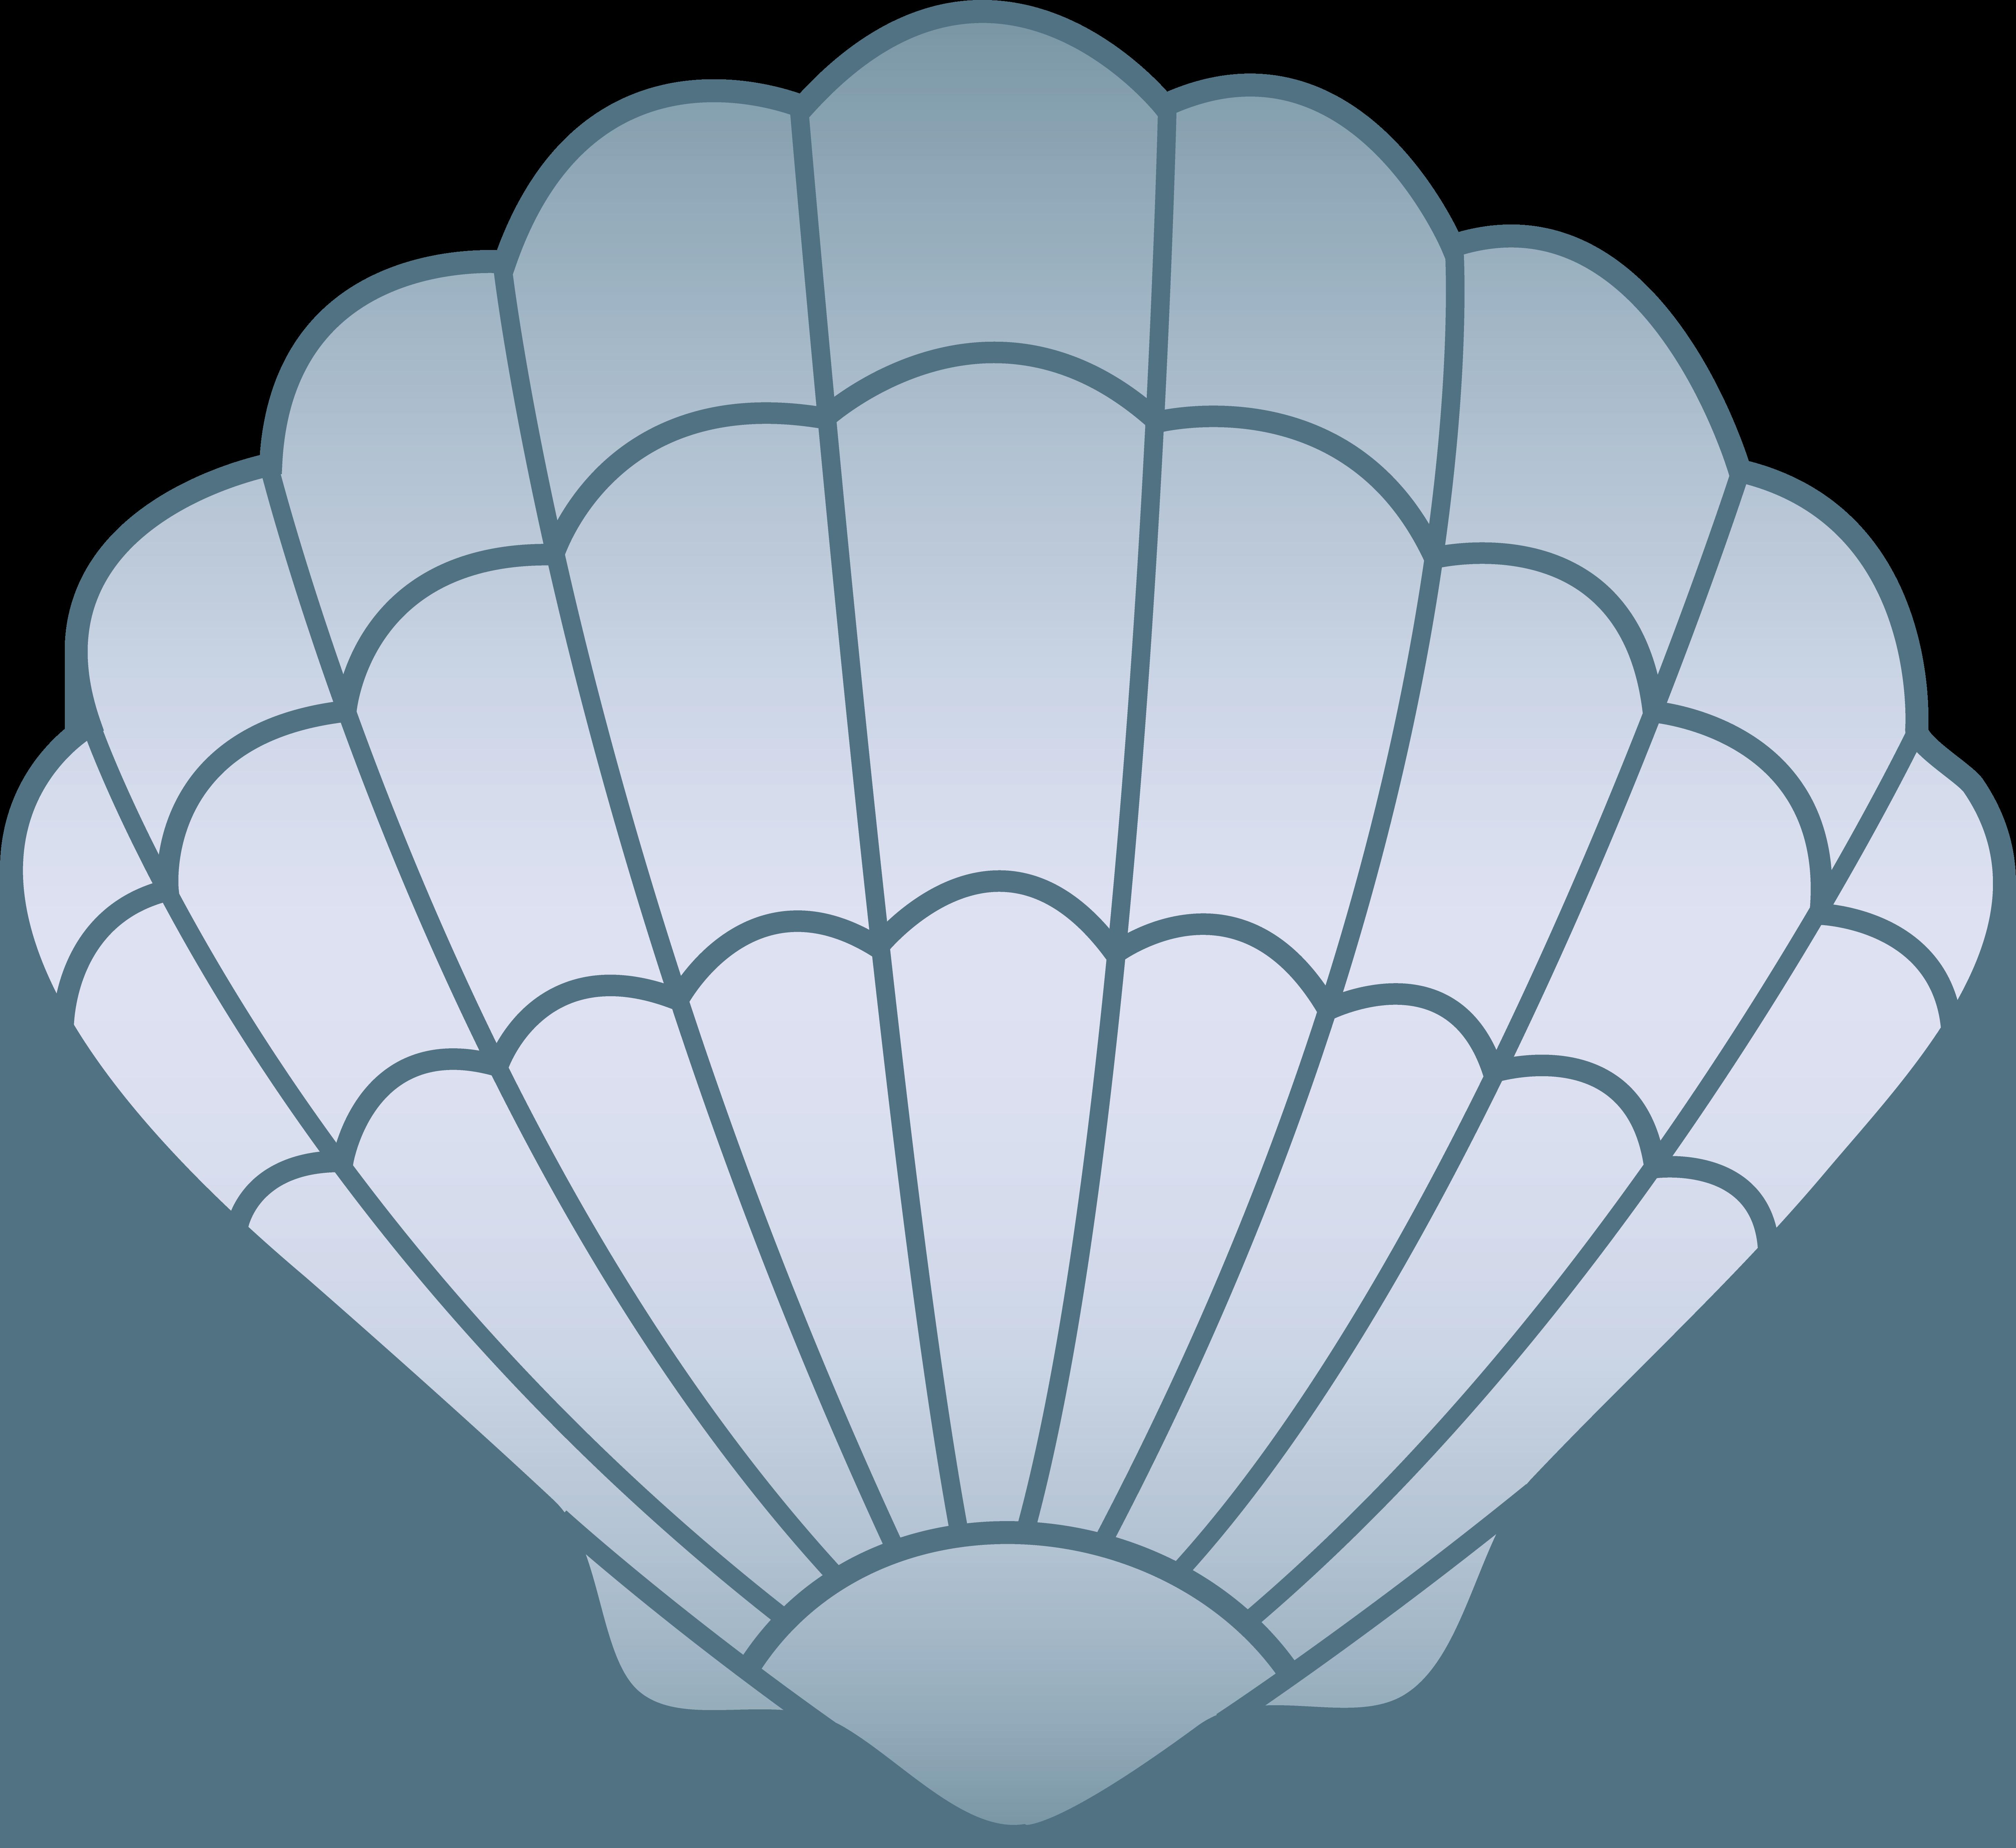 Shell clipart blue sea. Seashell free clip art